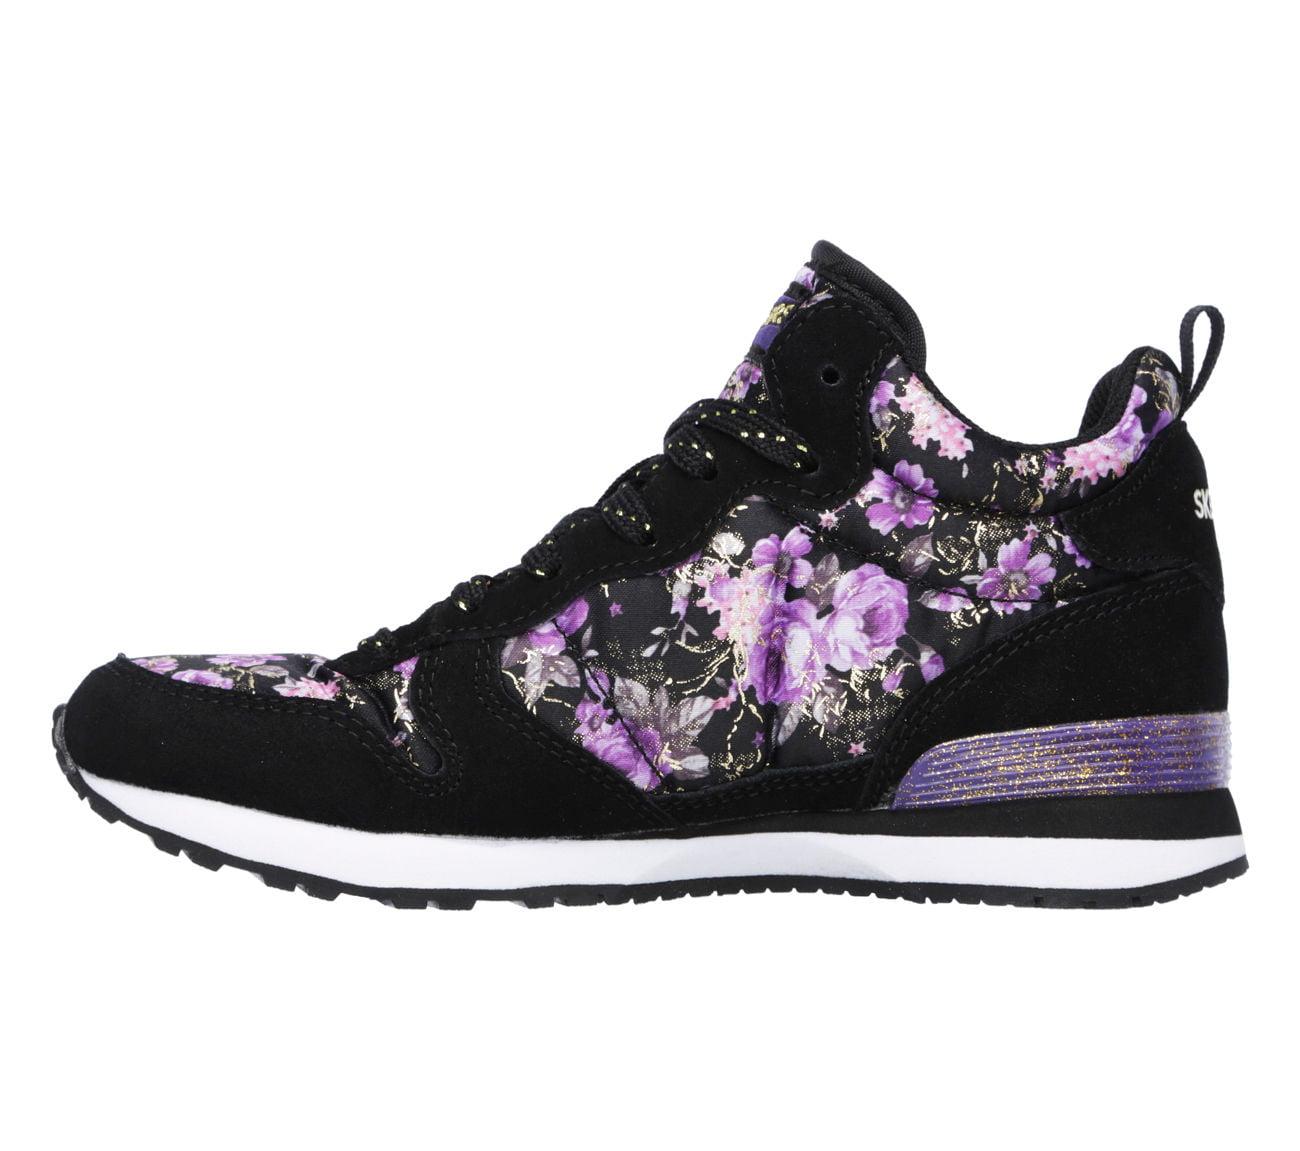 7f3bfe5503b0 Skechers - Skechers 84210 BKPR Girl s RETROSPECT - HOLLYWOOD ROSE Sneaker -  Walmart.com